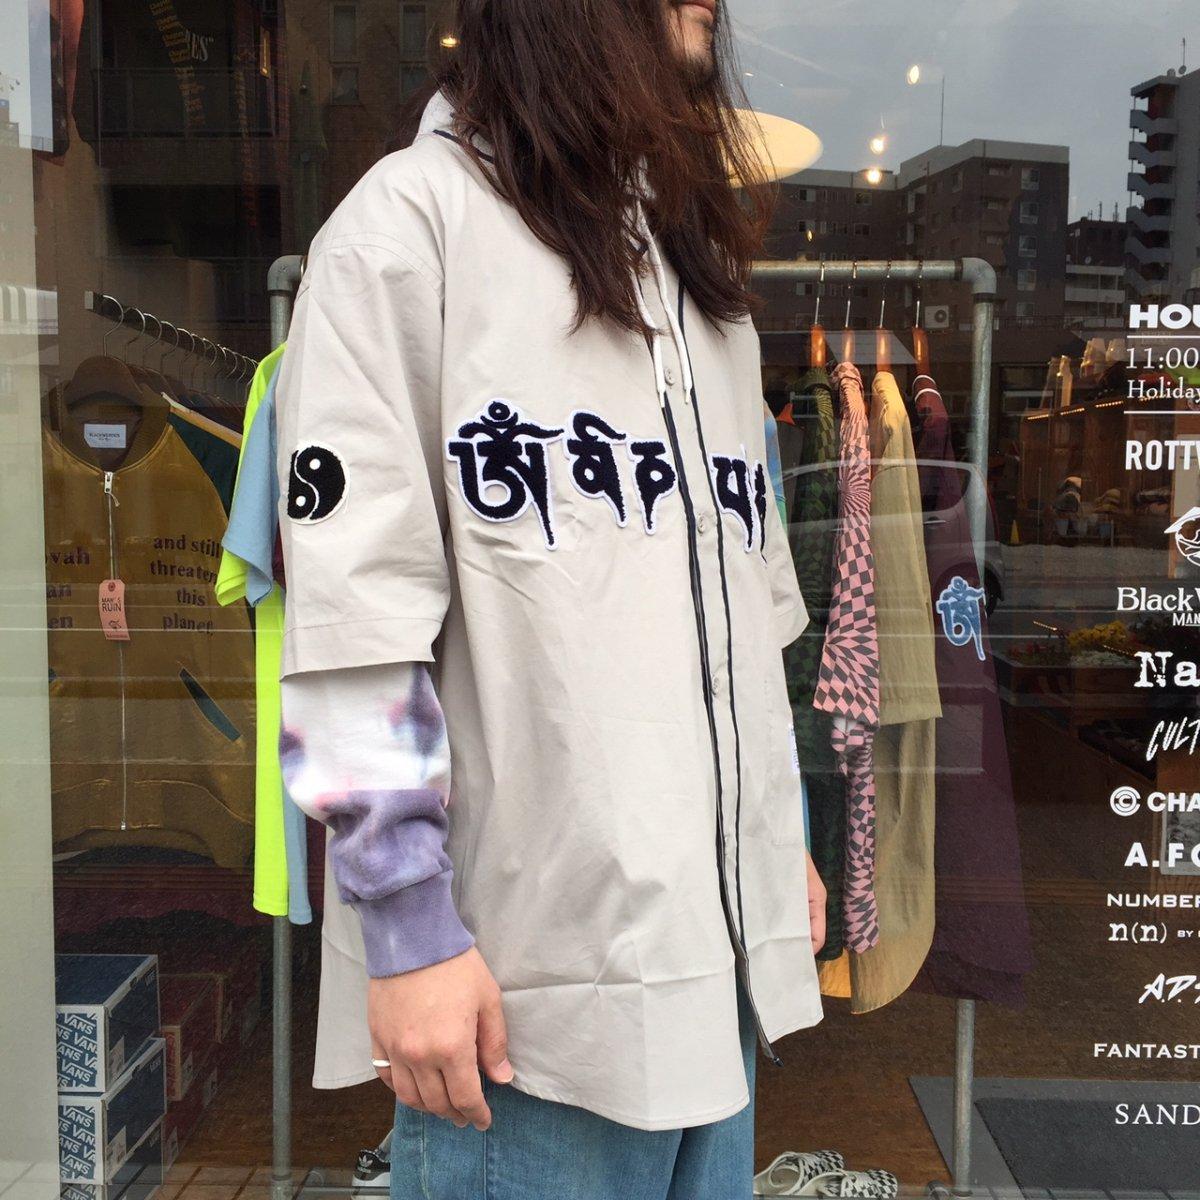 <img class='new_mark_img1' src='https://img.shop-pro.jp/img/new/icons3.gif' style='border:none;display:inline;margin:0px;padding:0px;width:auto;' />Black weirdos  ブラック ウィドー / シャツ Mantra Baseball Shirt 【GRAY】